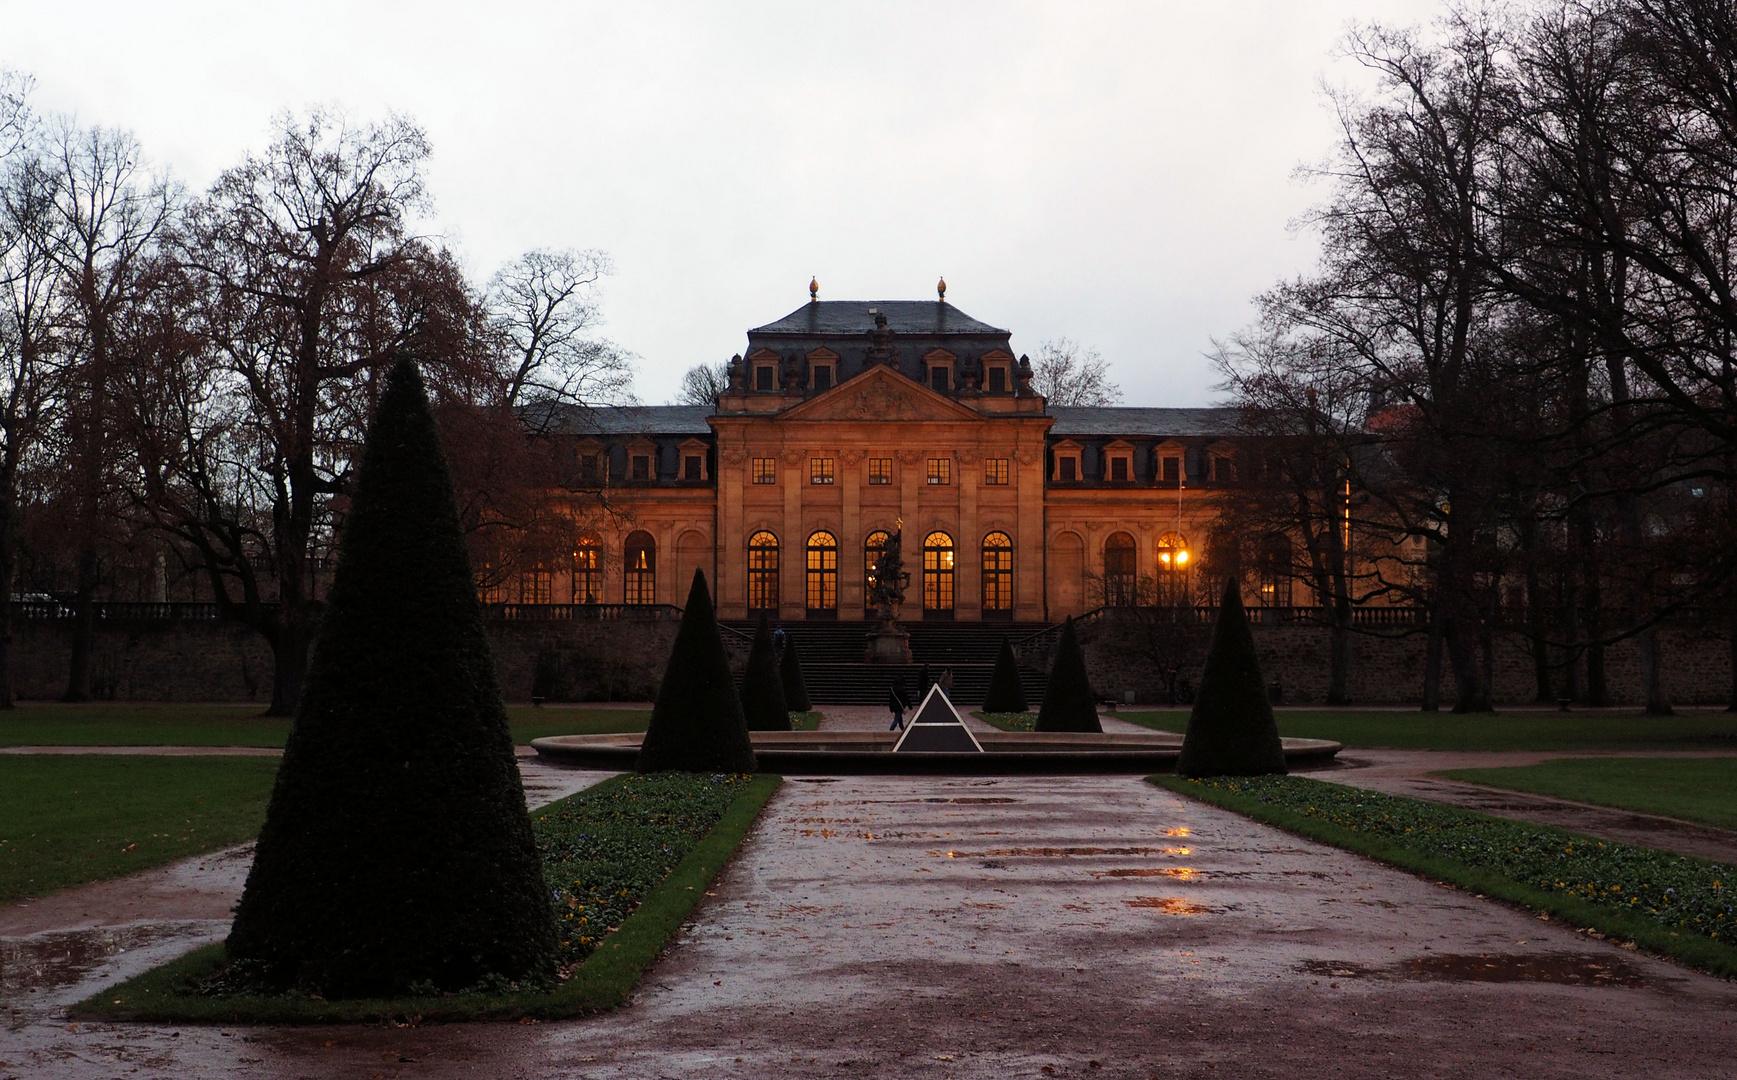 Ehemalige Orangerie Schloss Fulda ...